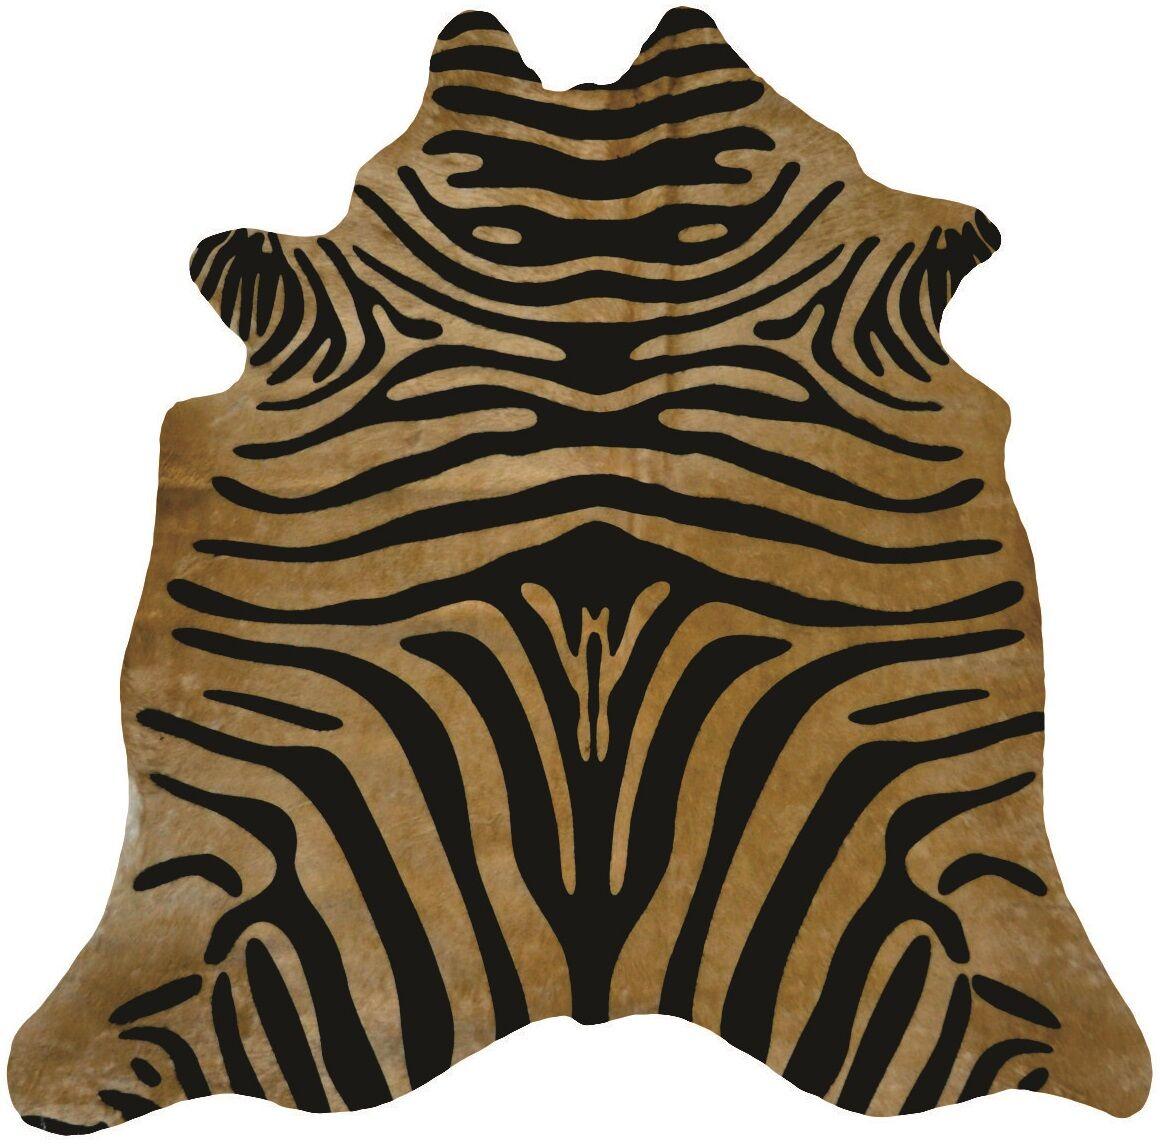 Astonishing Exquisite Zebra Design Vibrant Hand-Woven Black/Caramel Area Rug